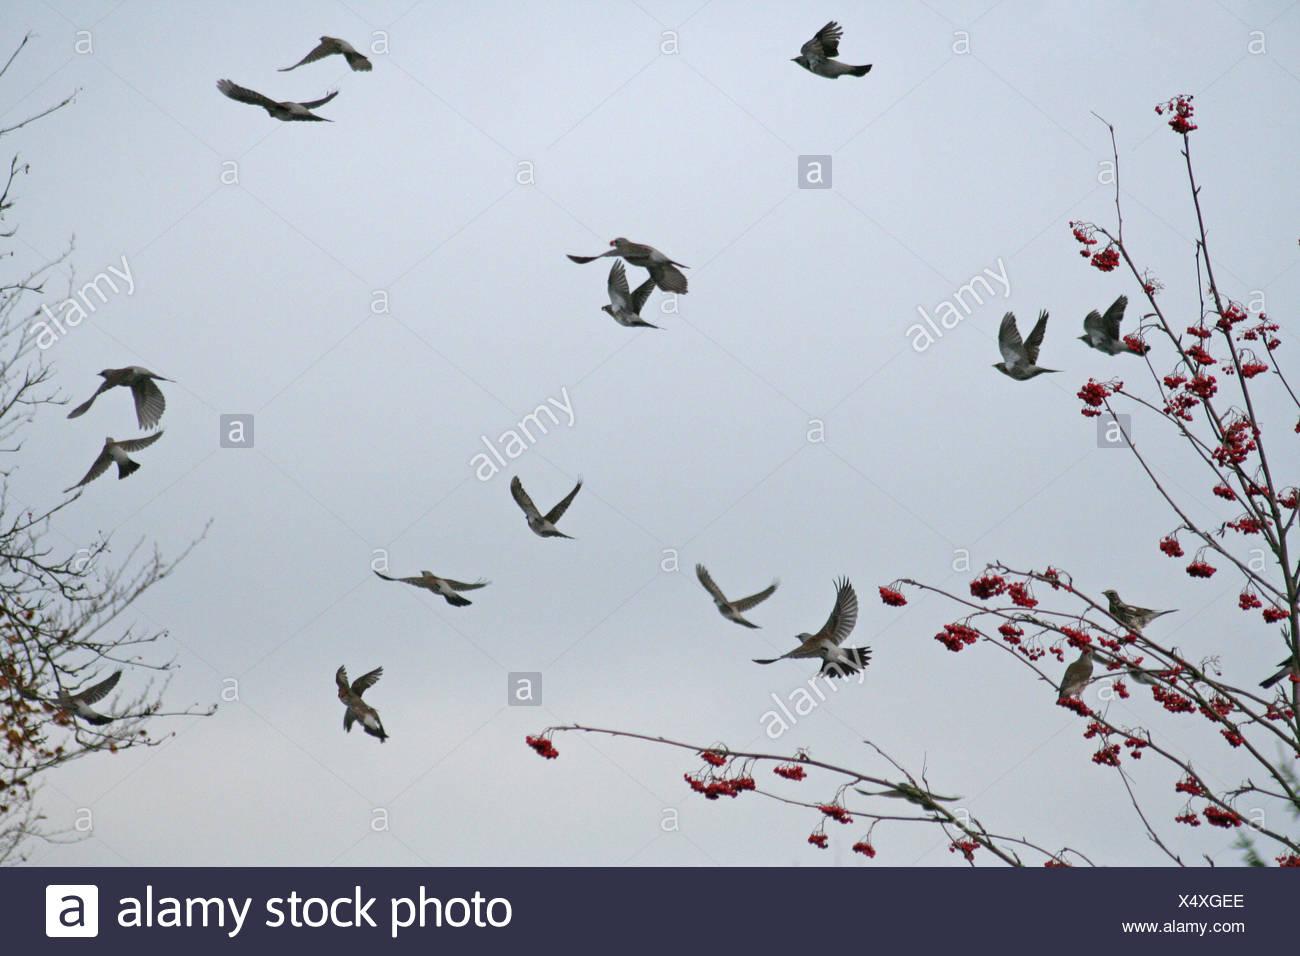 bird brown brownish brunette birds europe wing resin visit rowan berries pull Stock Photo